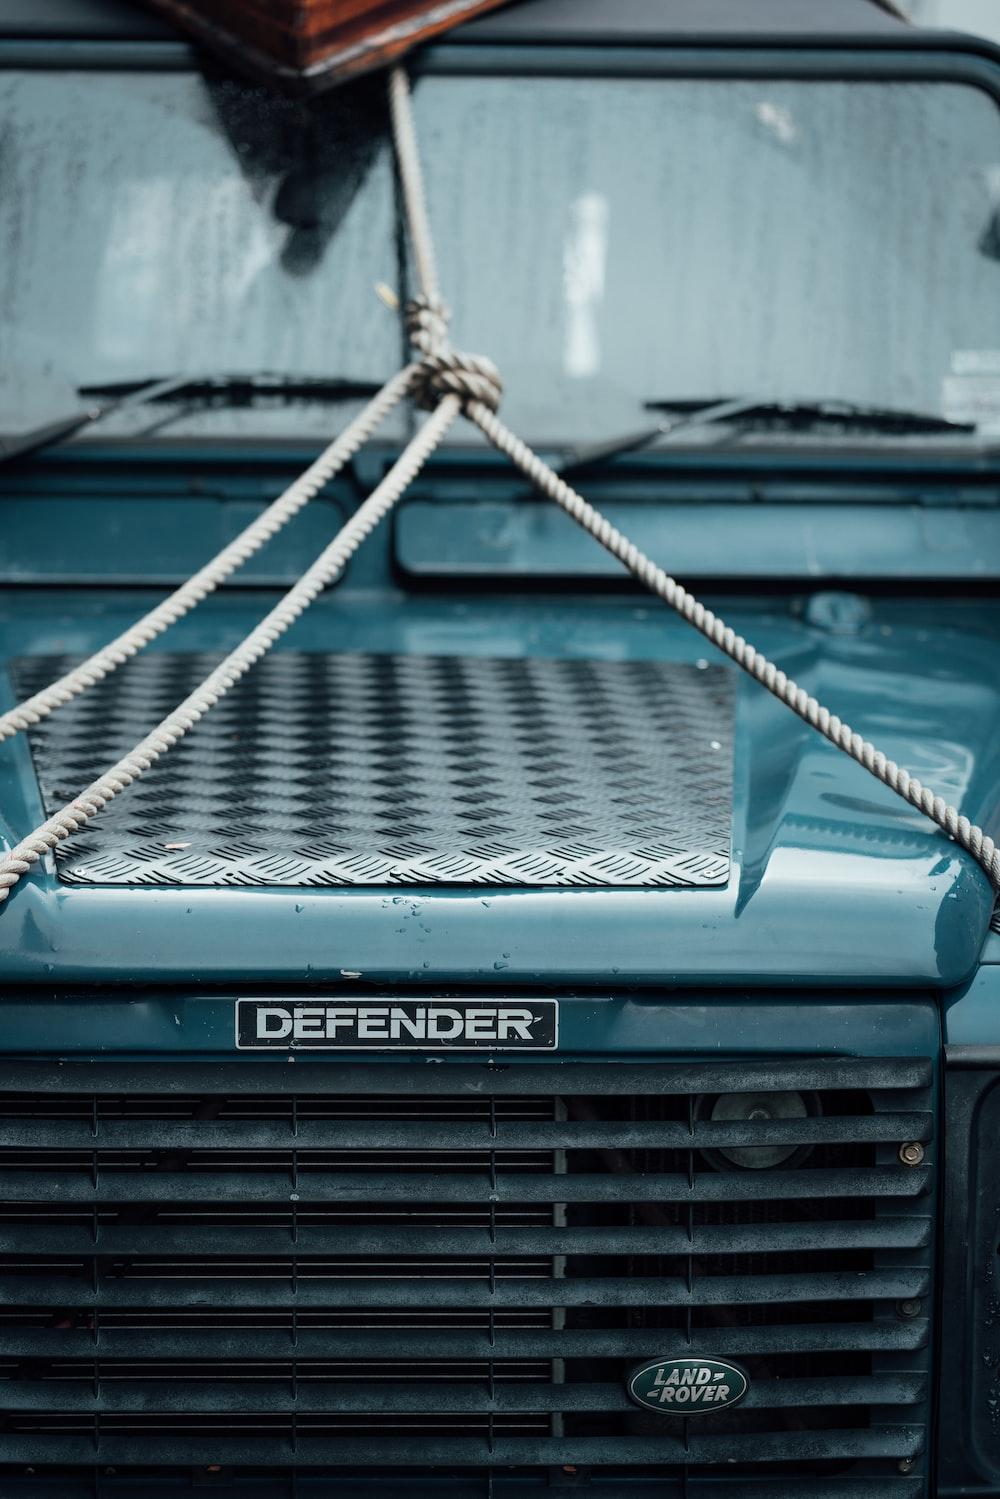 black Defender vehicle